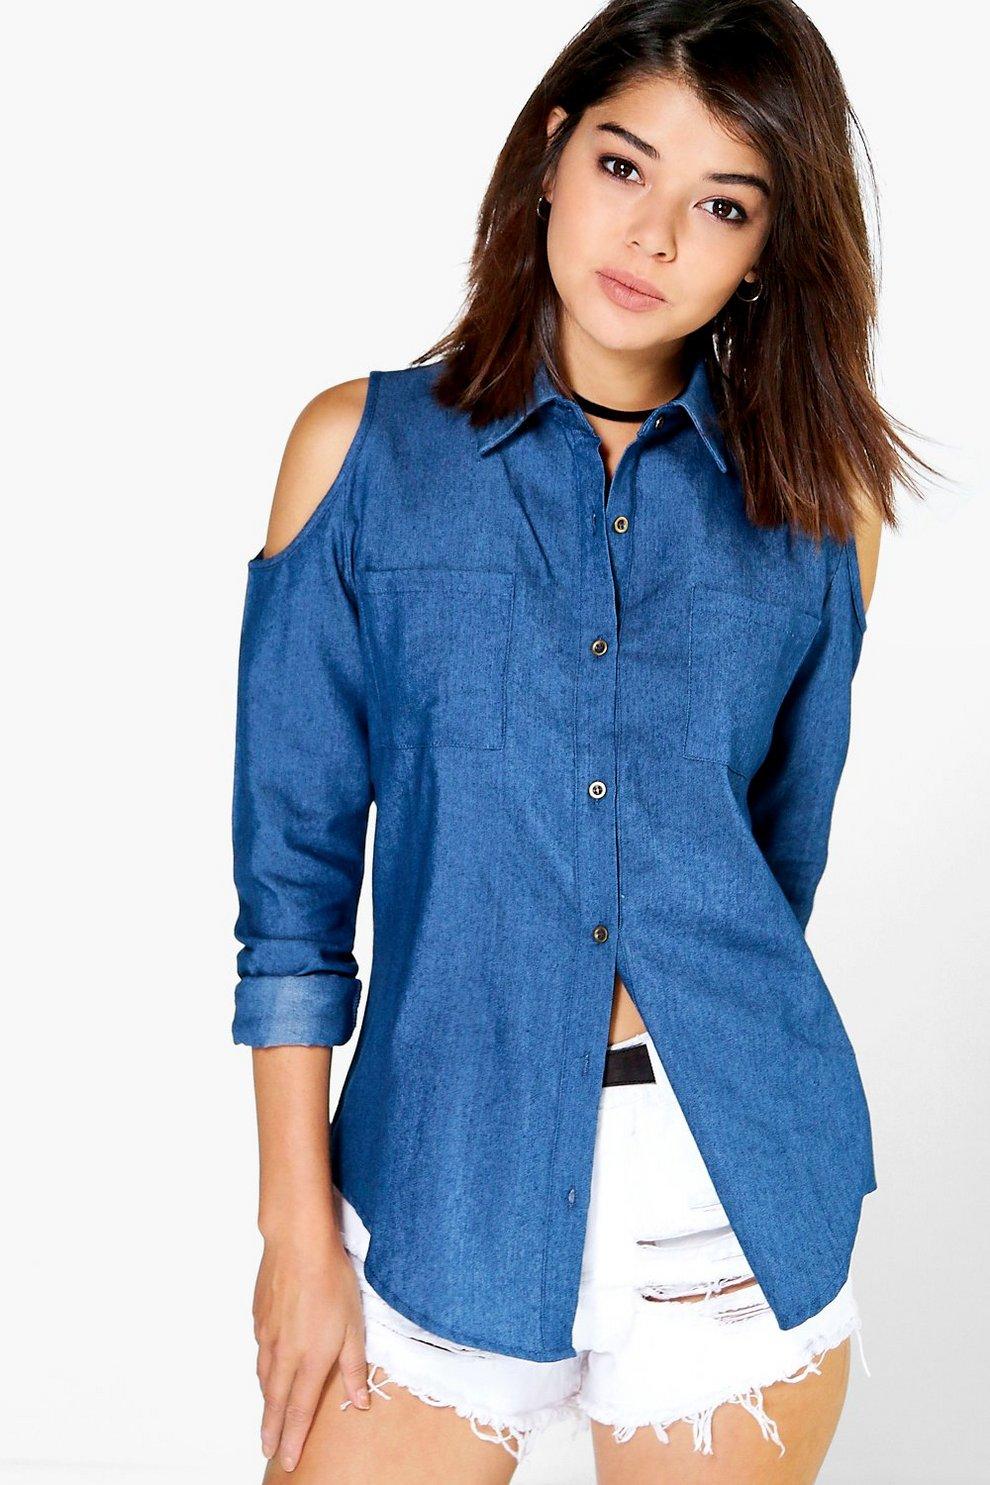 c7349c9b34d1 Amy Open Shoulder Denim Shirt